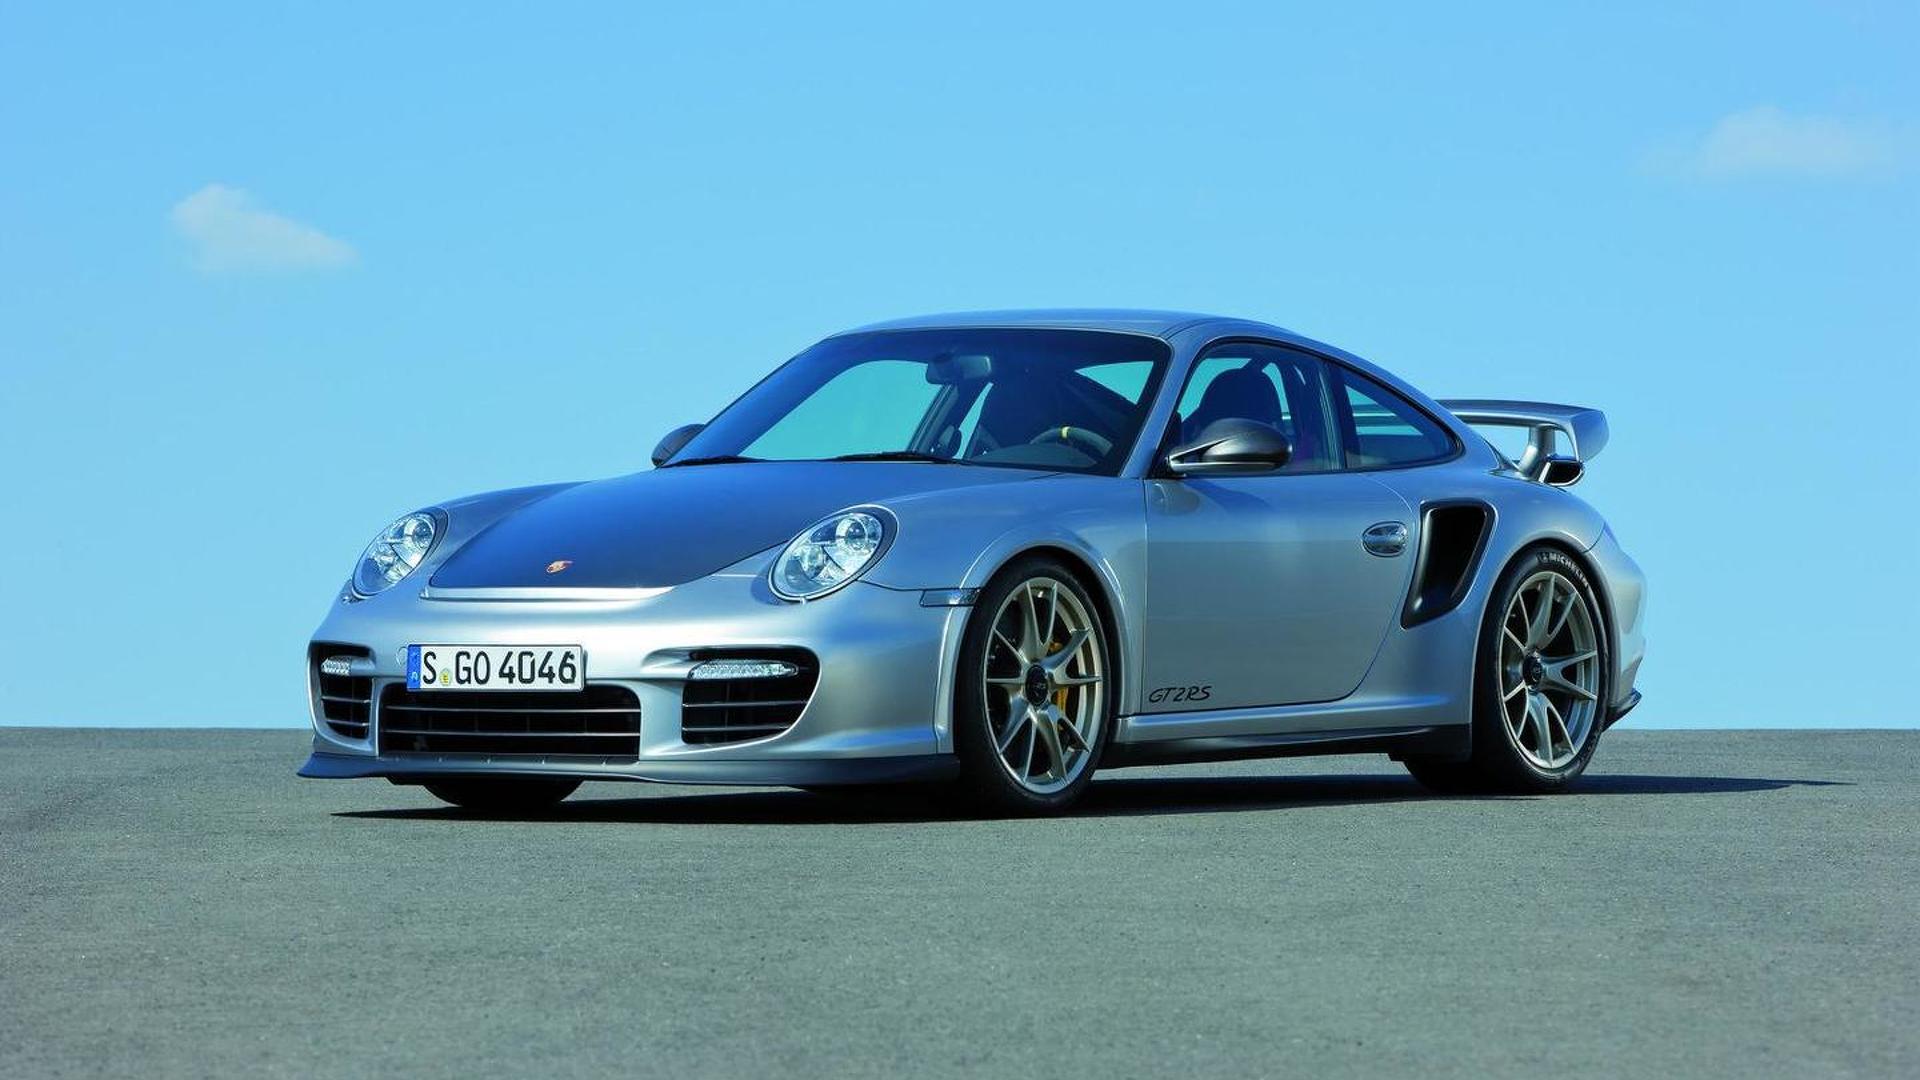 2011-227099-2011-porsche-911-gt2-rs-11-03-20111 Stunning Porsche 911 Gt2 Rs Vs Lamborghini Aventador Cars Trend